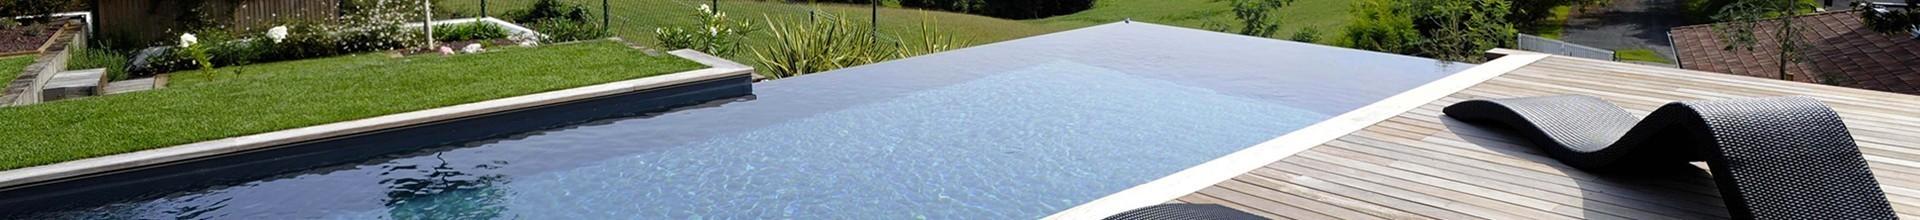 Direct usine, piscine coque prix Meurthe-Moselle